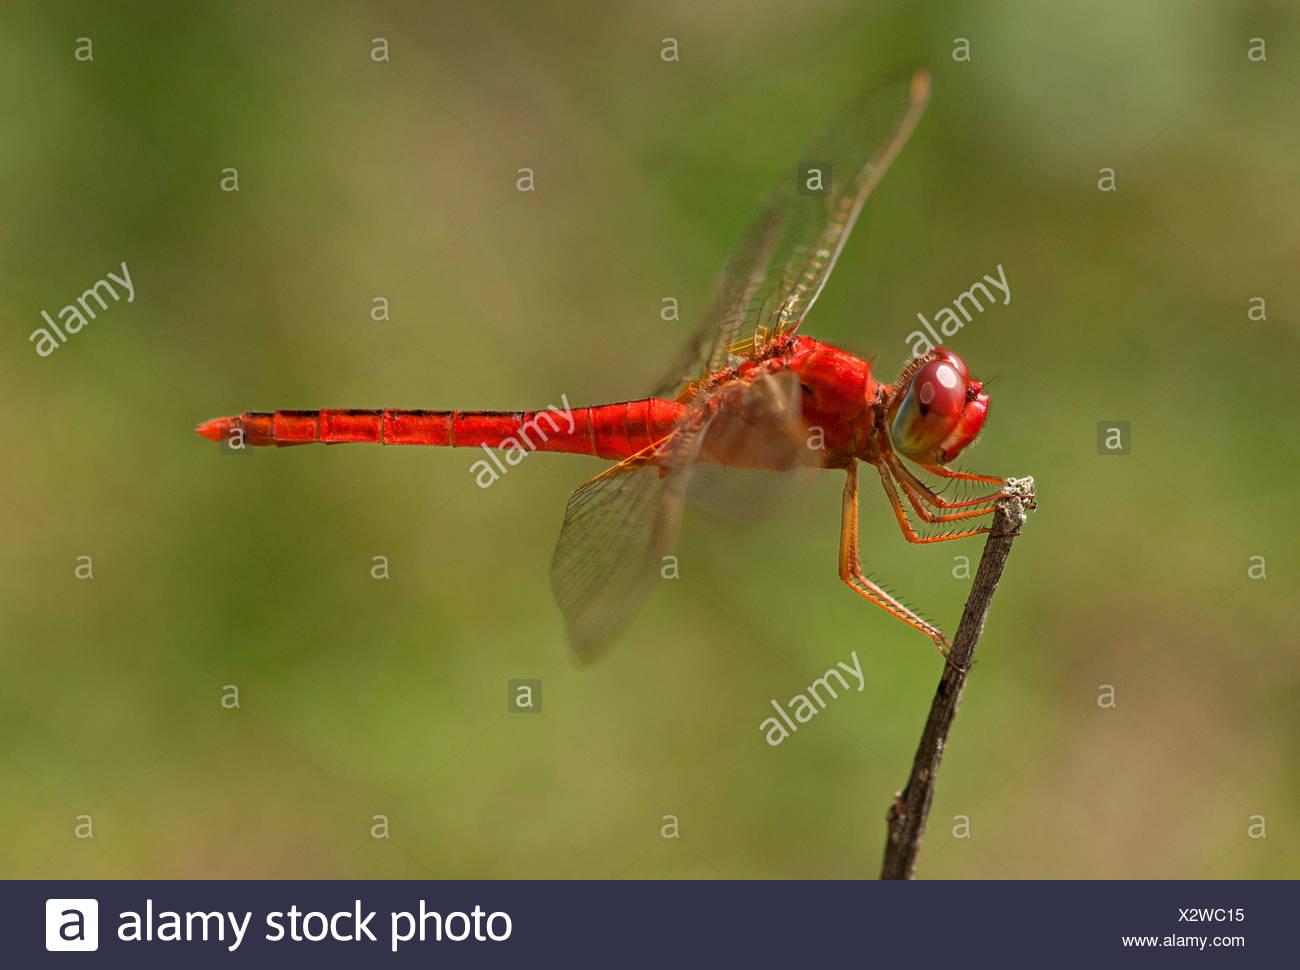 Scarlet skimmer, crimson darter (Crocothemis servilia), male, Battambang, Cambodia, Southeast Asia, Asia - Stock Image